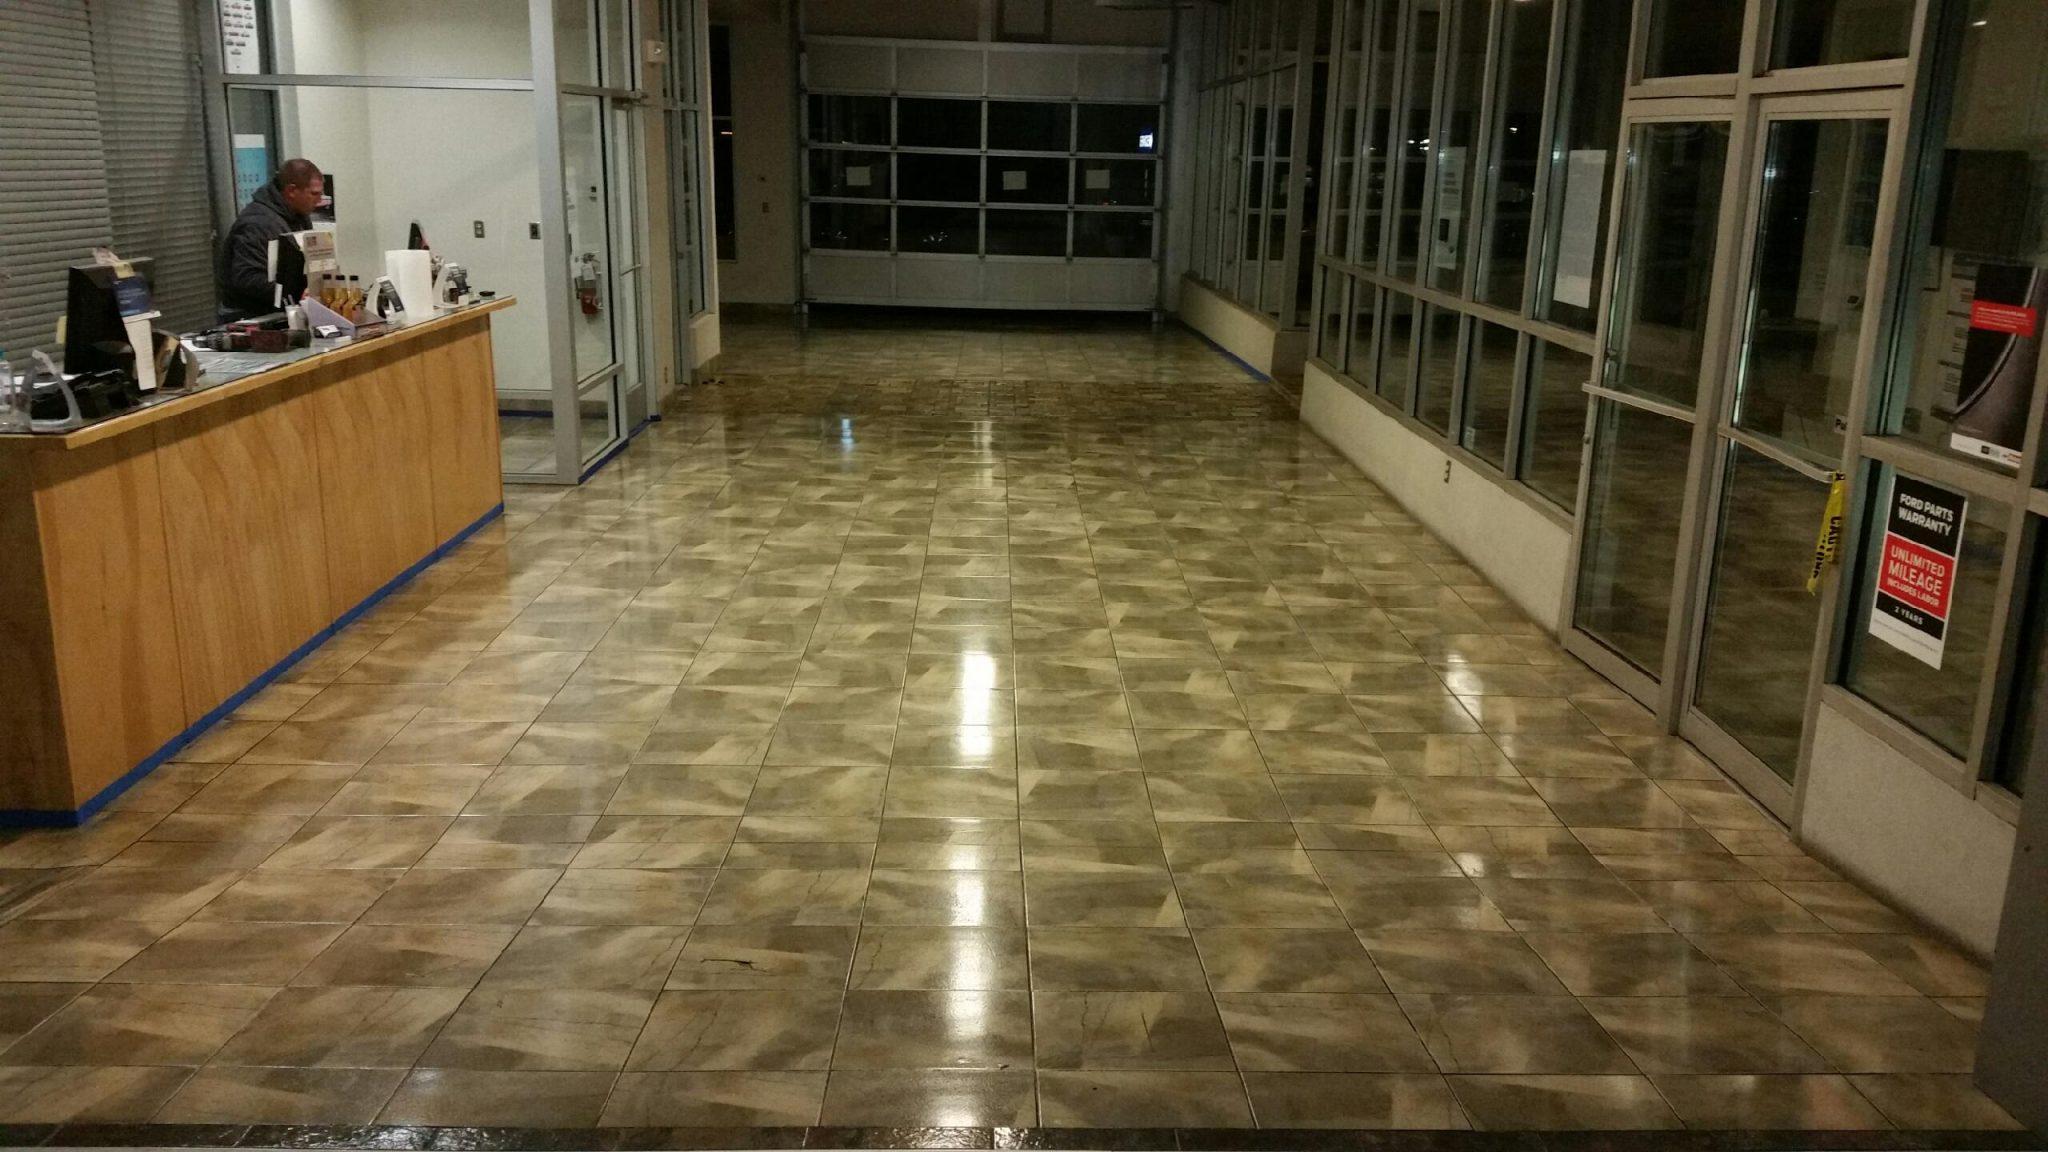 decoration concrete pictures acid floors decor finishes ideas stain cement inspirations home cleaner cool floor terrific paint